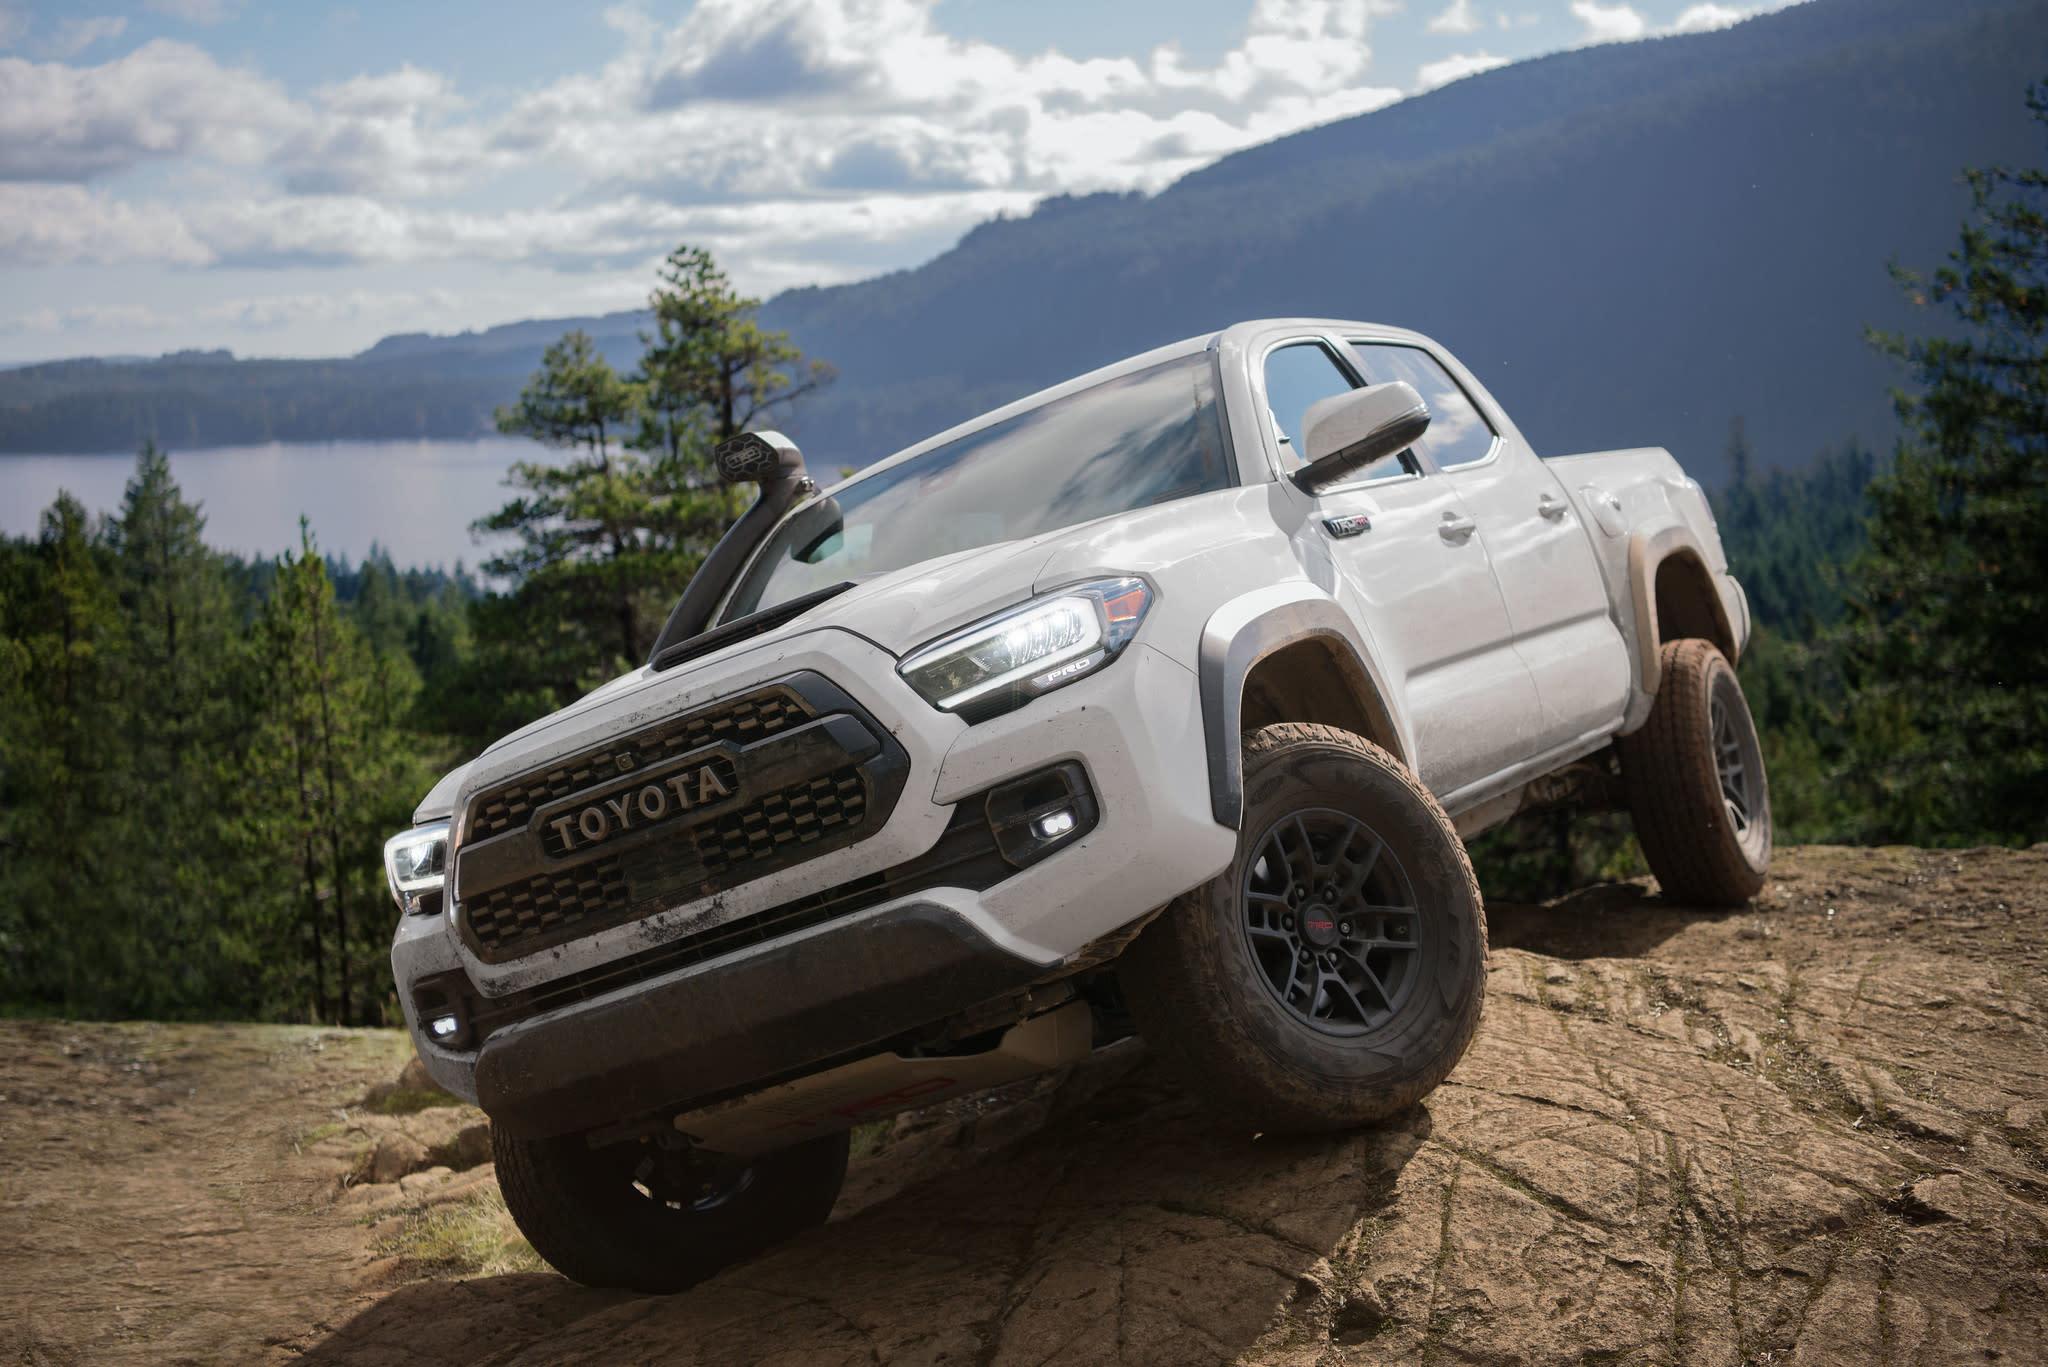 2020 Toyota Tacoma - Dixon, IL